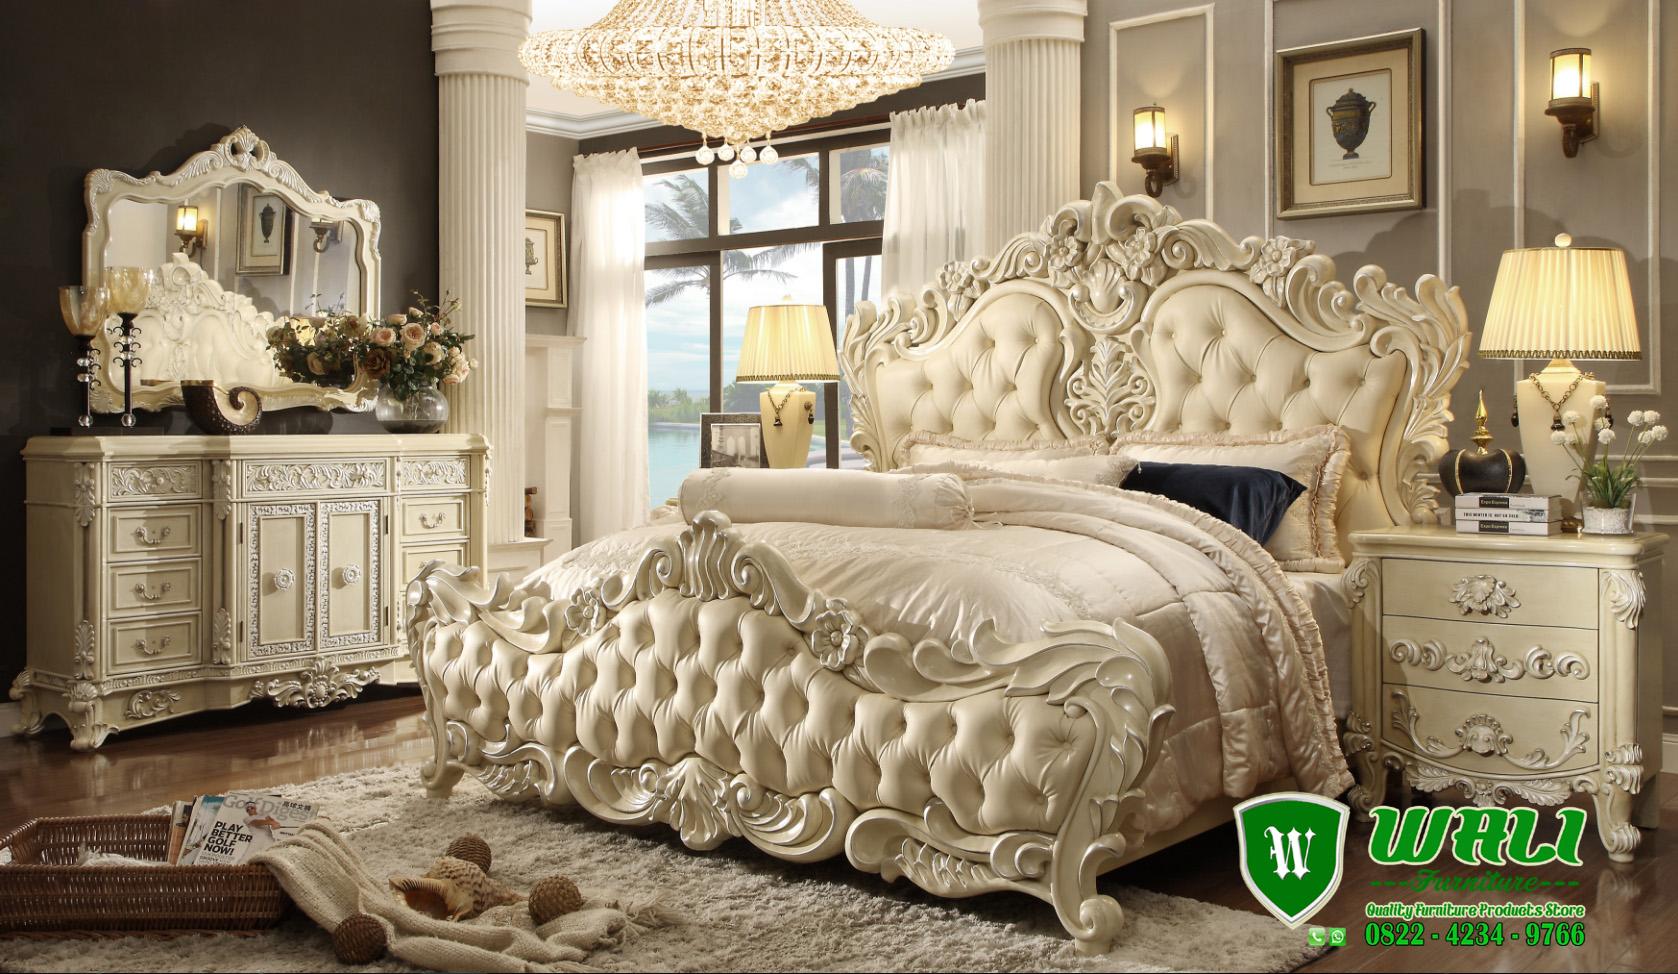 Tempat Tidur Klasik Eropa Set Duco Ukiran Terbaru, Tempat Tidur Dewasa, Set Tempat Tidur Model Ukiran, 1 Set Tempat Tidur Mewah, Model Tempat Tidur Duco, Desain Tempat Tidur Ukiran, Kamar Set Duco Mewah, Luxury Bedroom Italian, Best Bedroom Eropa, Furniture Kamar, Kamar Tidur Dewasa, Contoh Kamar Tidur Mewah, Gambar Tempat Tidur Klasik Eropa, Jual Tempat Tidur Klasik Eropa, Harga Tempat Tidur Klasik Eropa, Katalog Tempat Tidur Ukiran Terbaru, Wali Furniture